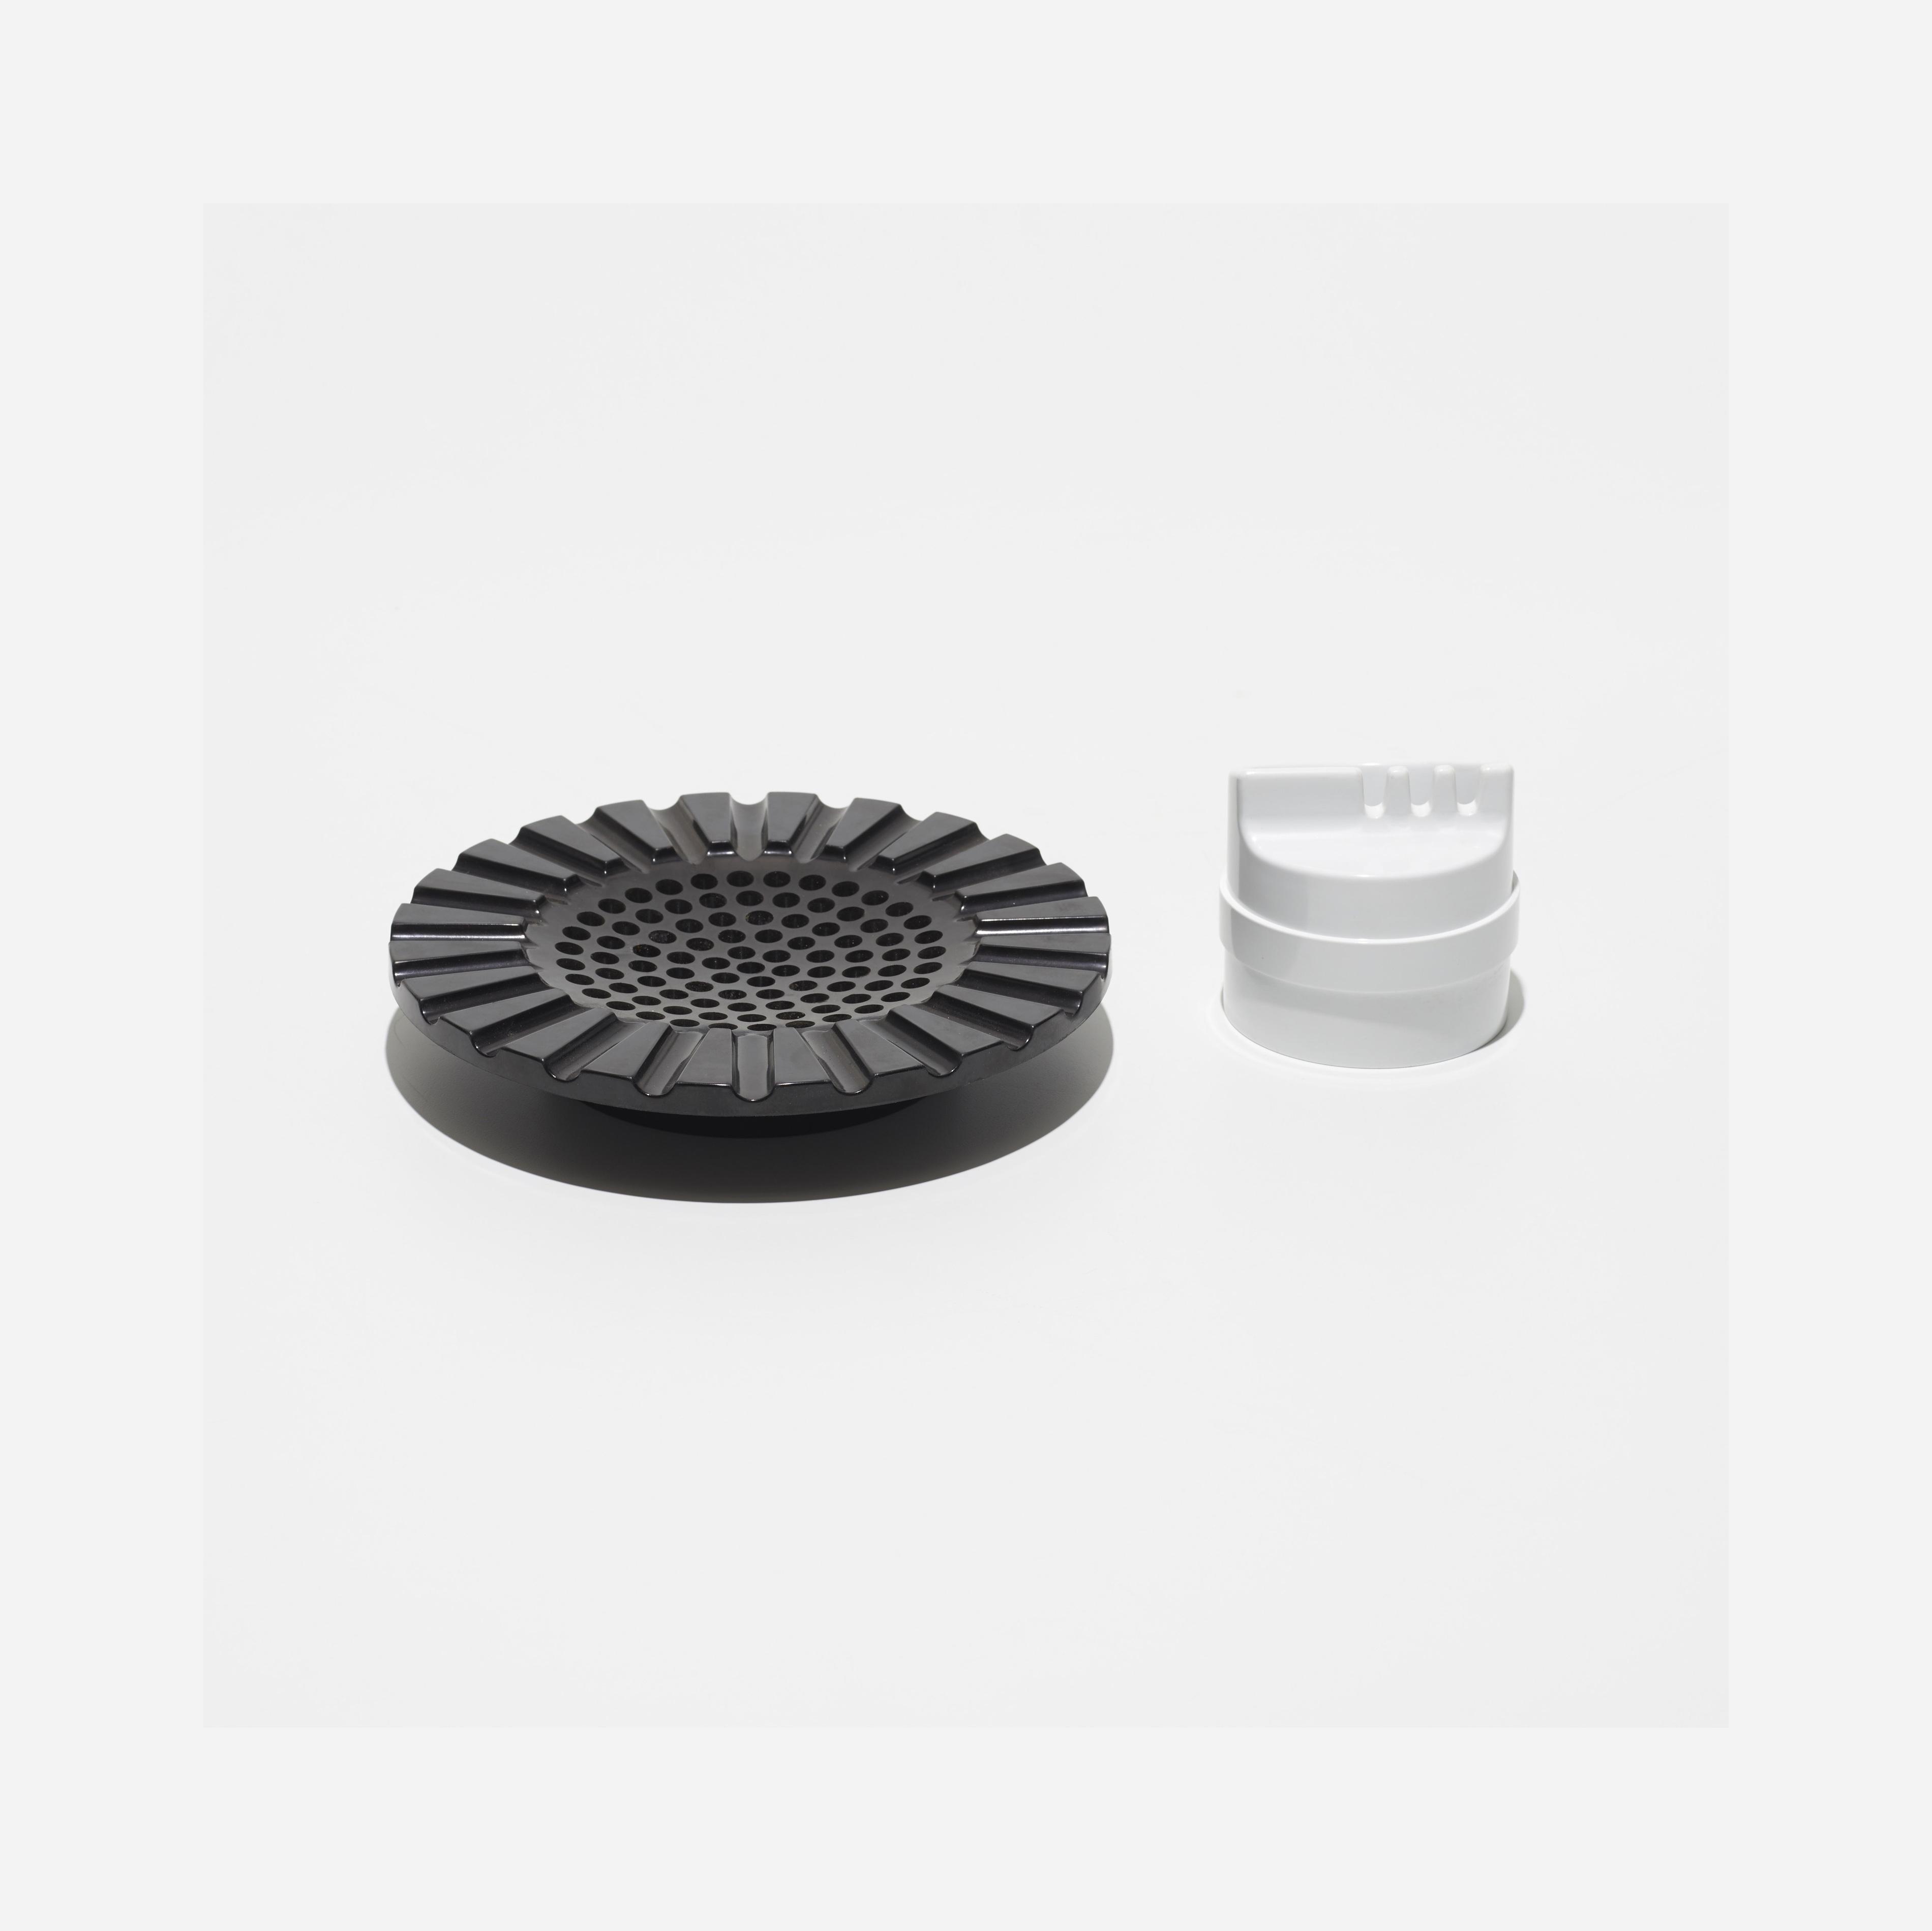 ashtrays, set of two - Kartell